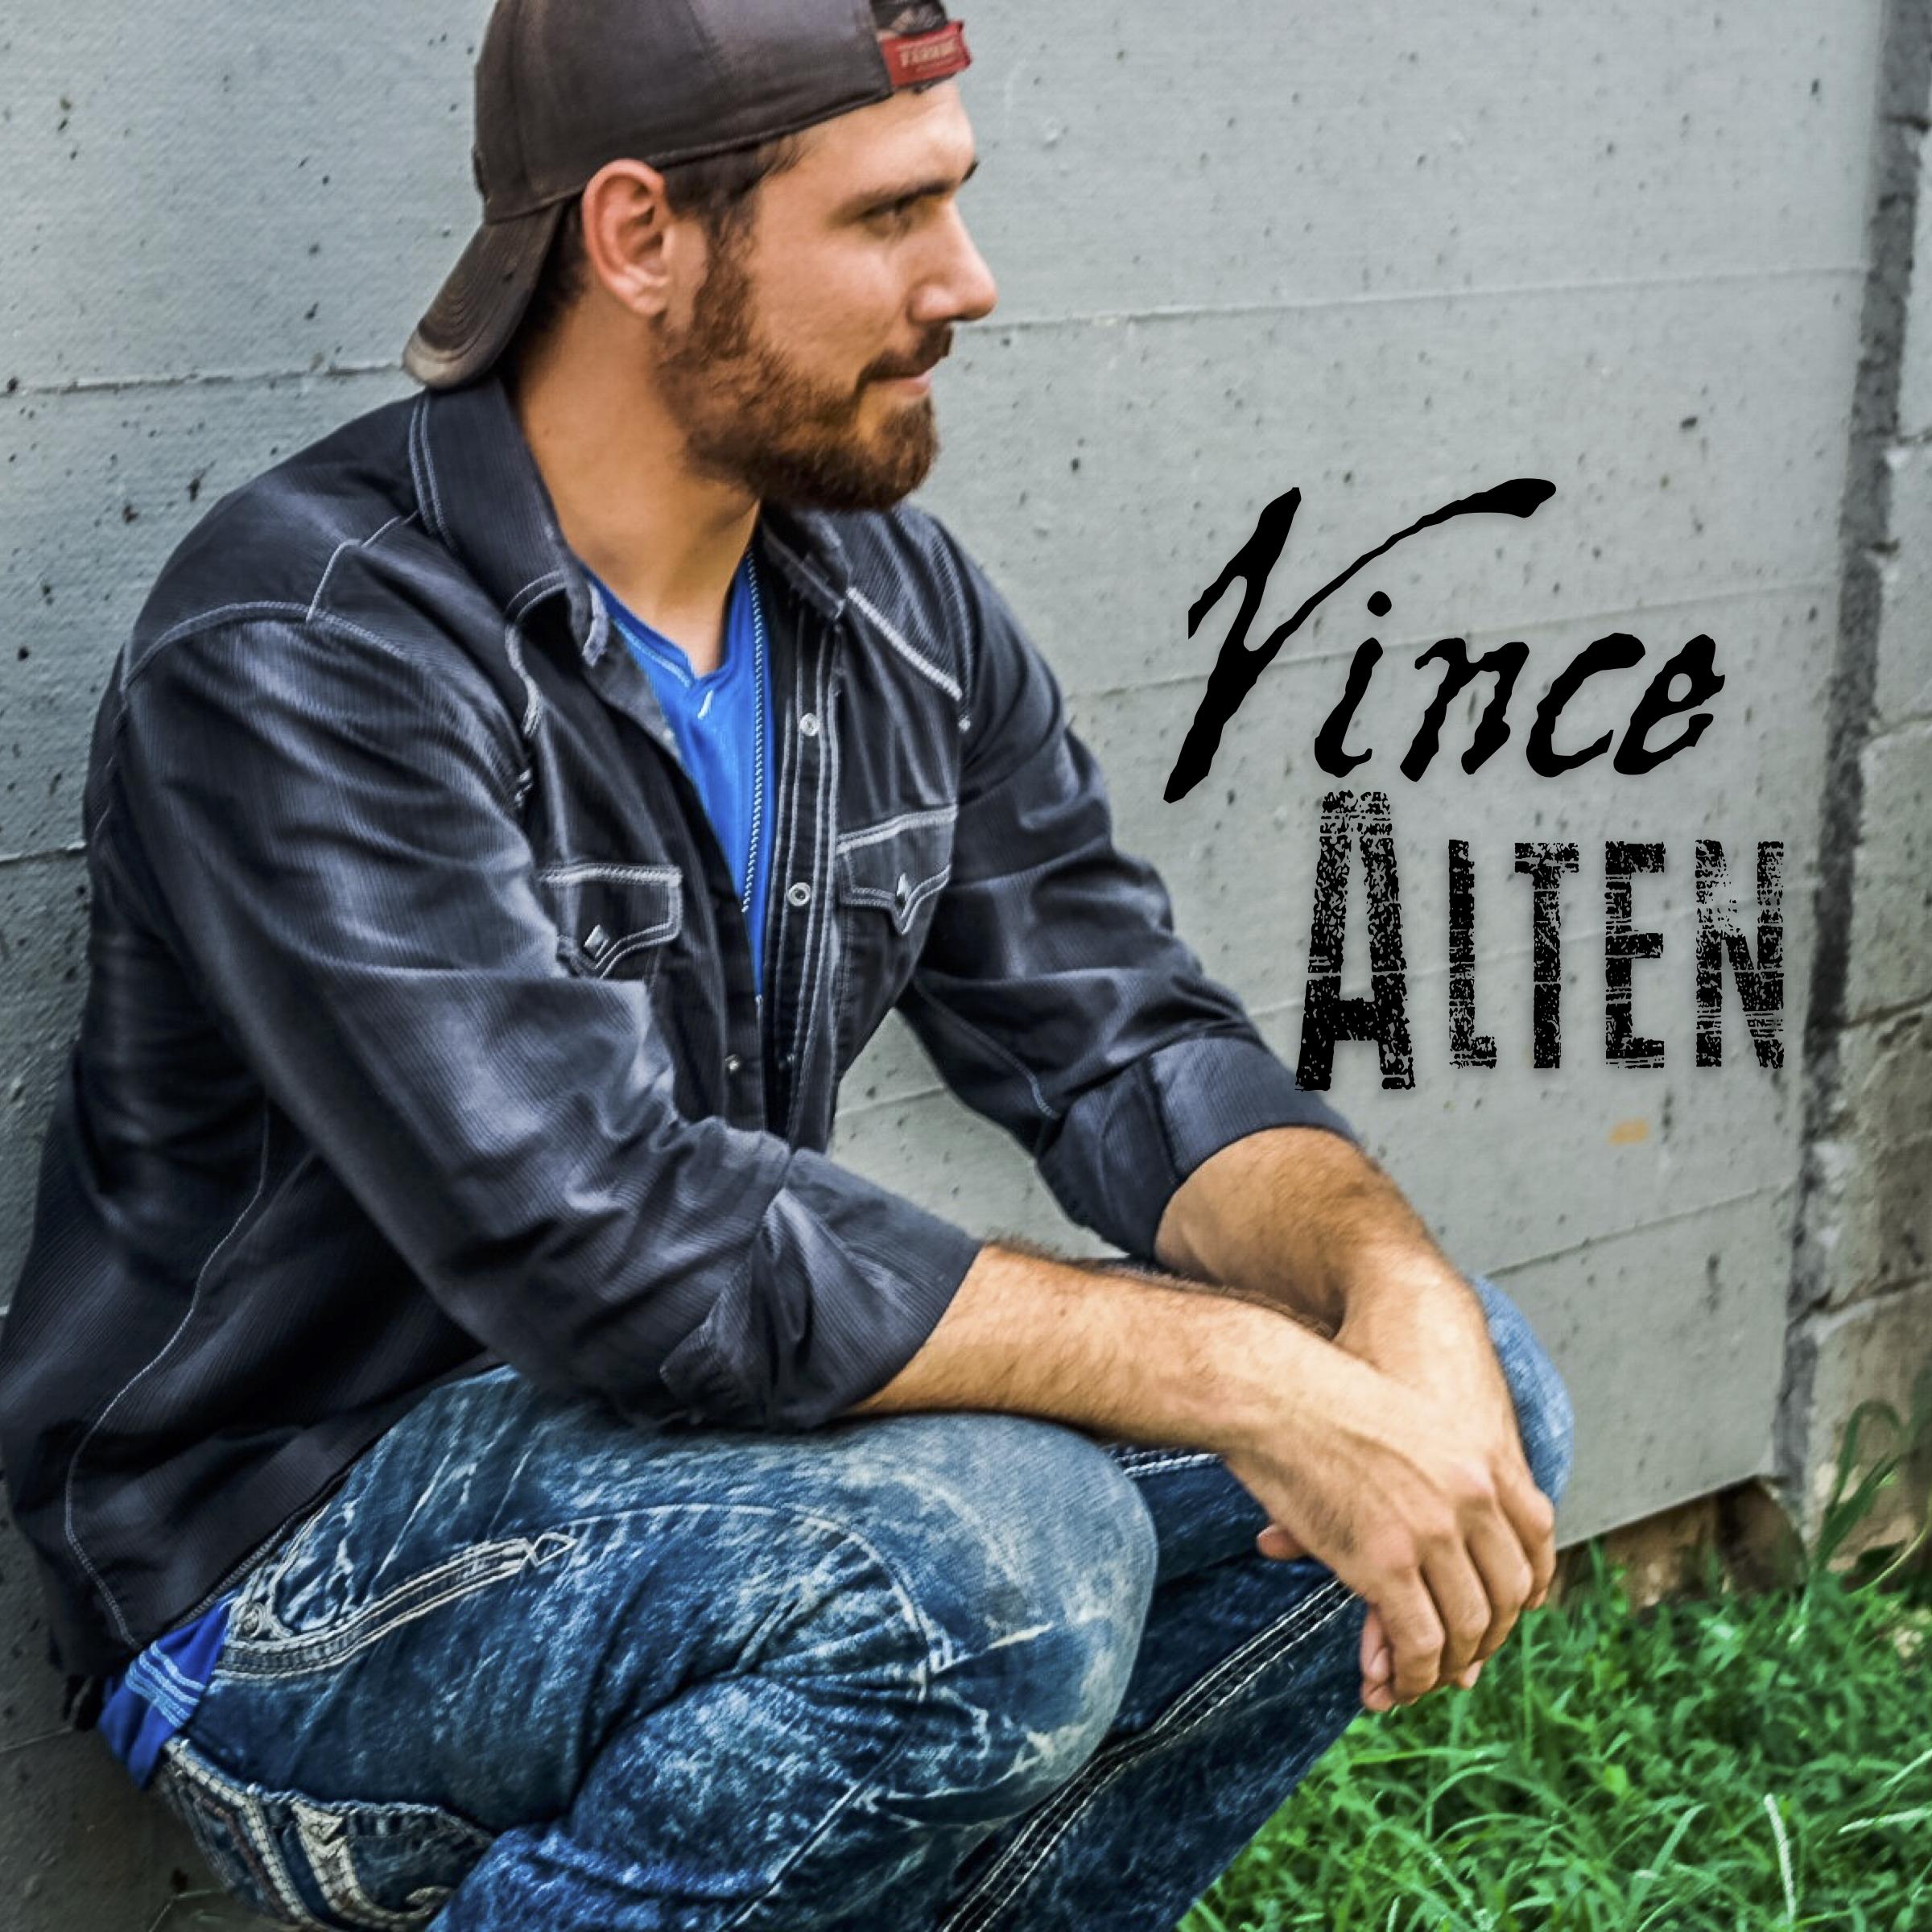 Vince Alten